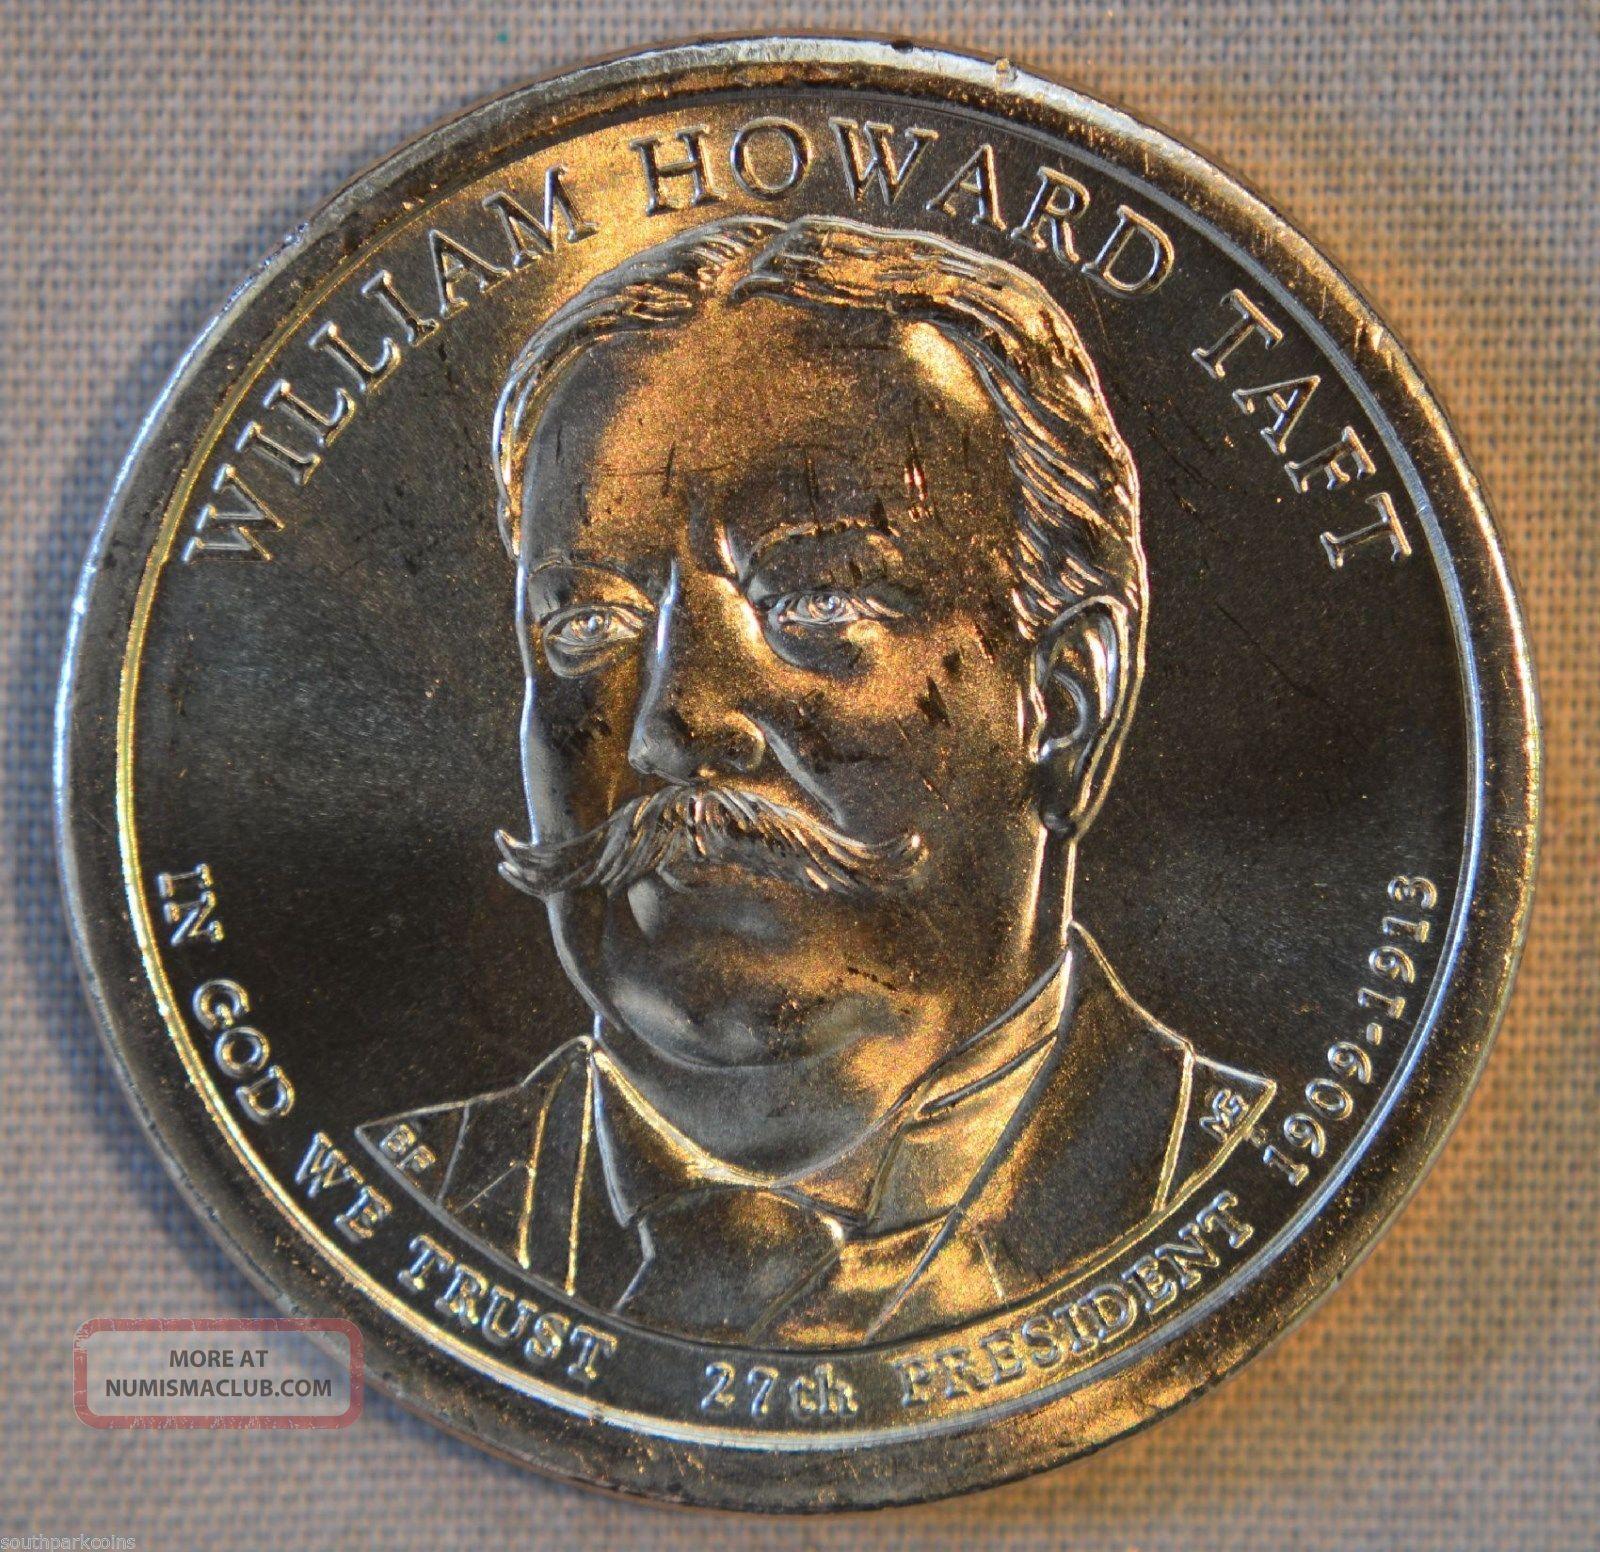 2013 - D William Howard Taft Uncirculated Presidential Dollar - Single Dollars photo